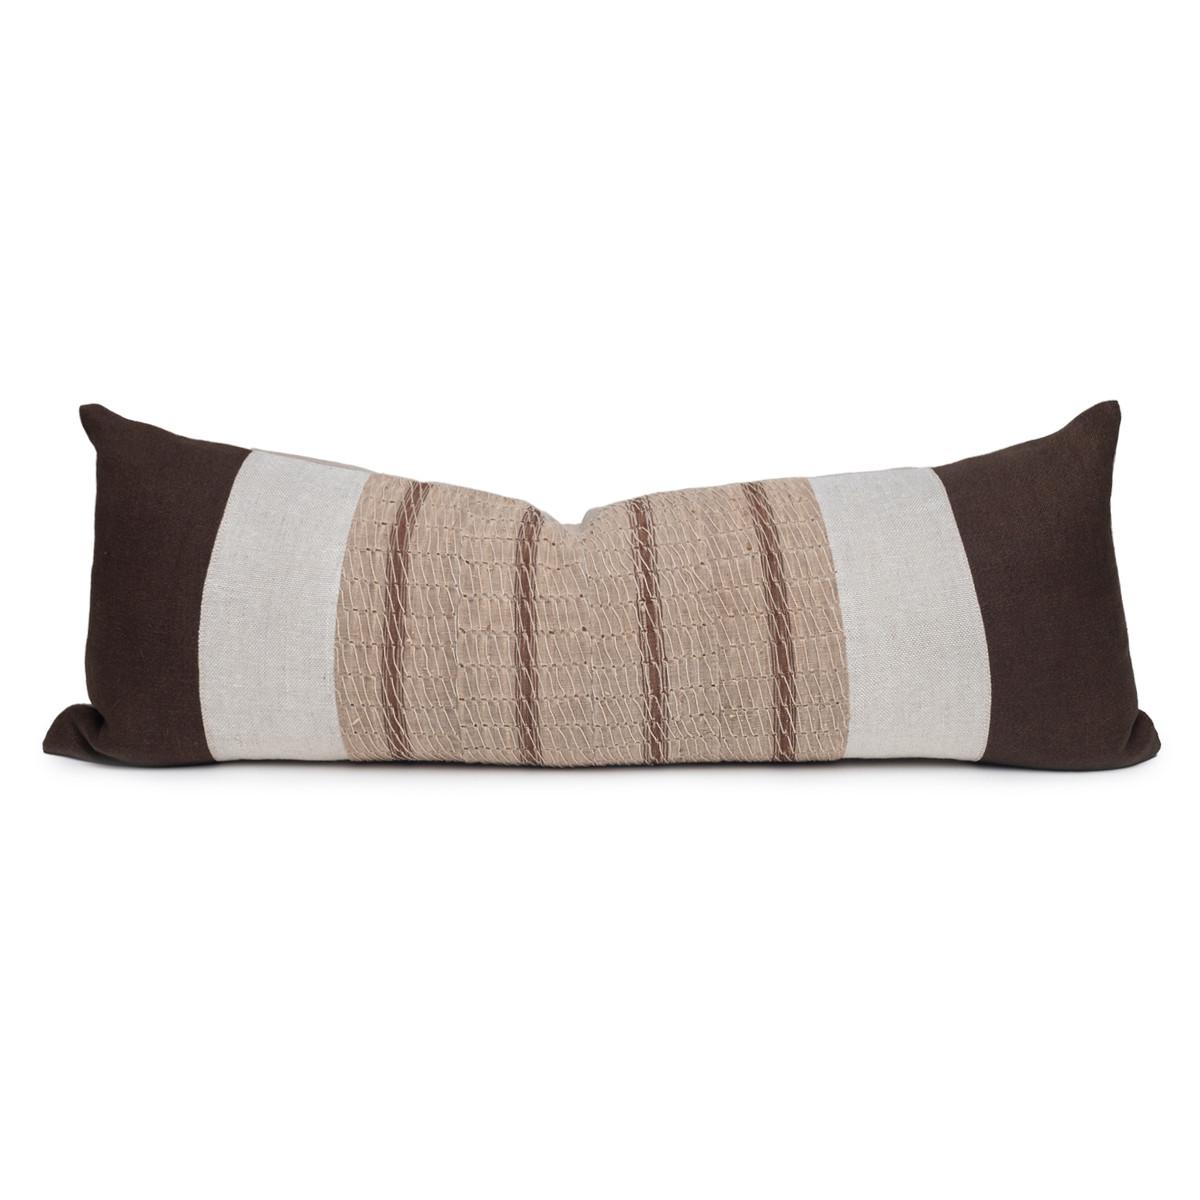 Ember Natural Linen and Aso Oke Lumbar Pillow - 14 x 36- Front View